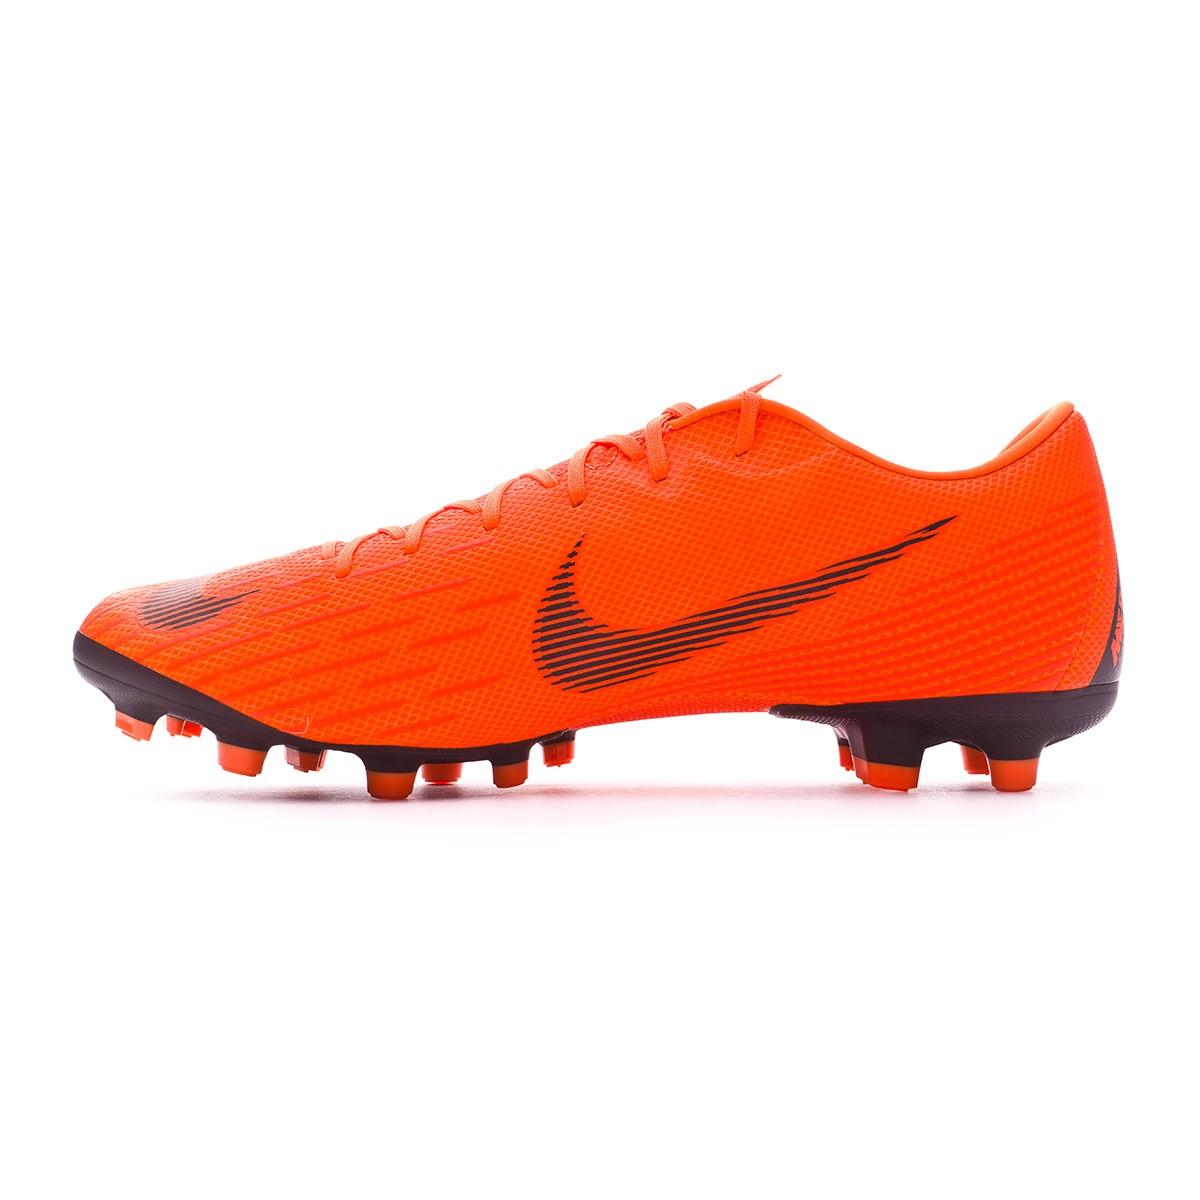 wholesale dealer b390a 7c865 Football Boots Nike Mercurial Vapor XII Academy MG Total orange-Black-Volt  - Tienda de fútbol Fútbol Emotion